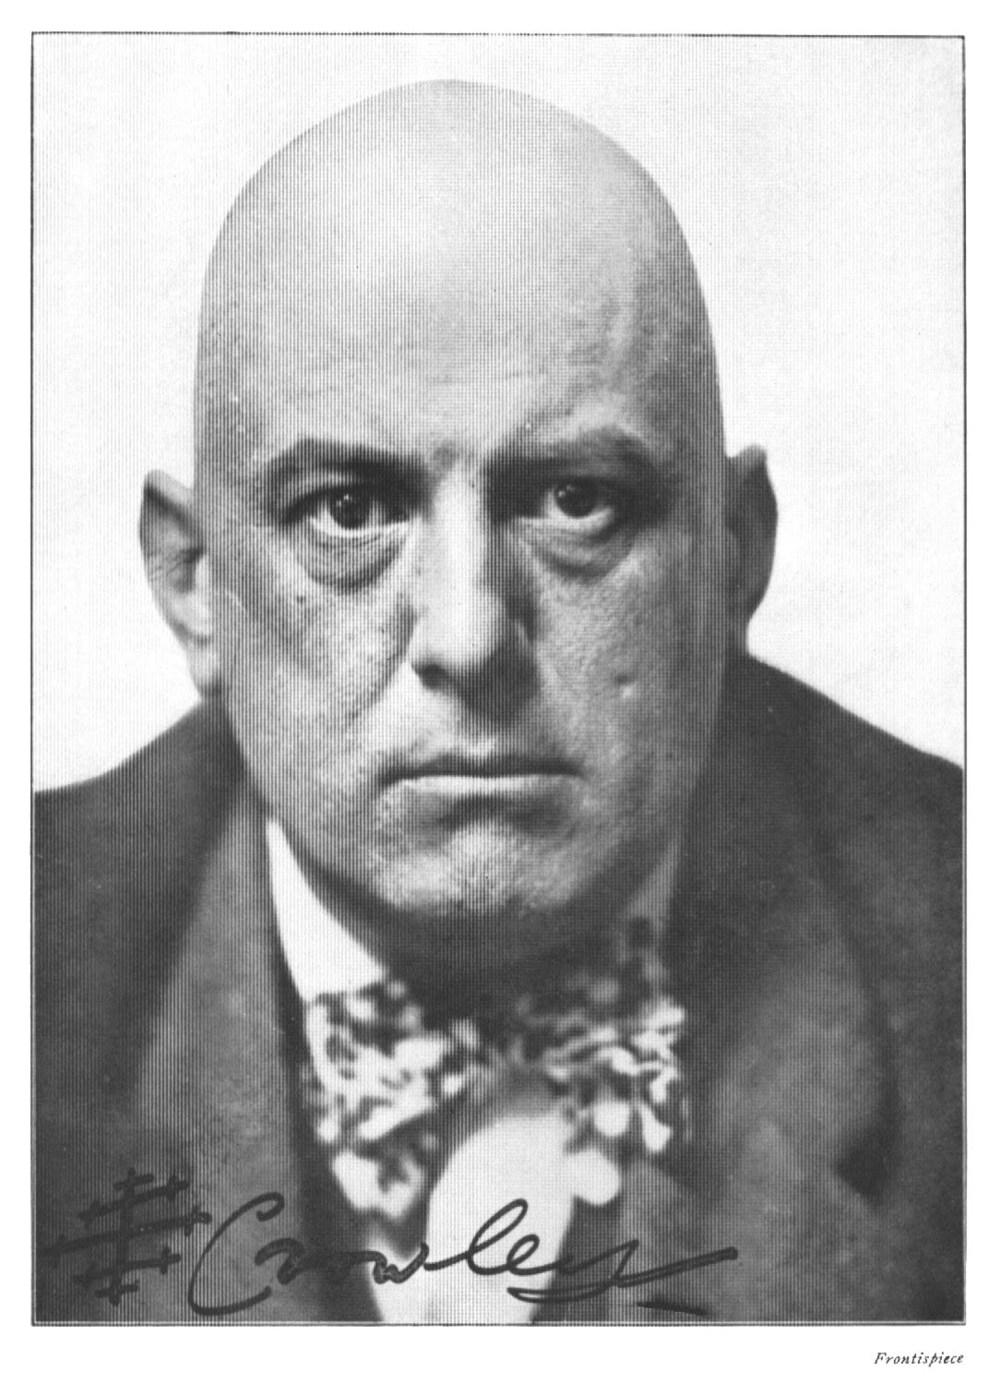 Crowley (via Wikipedia)